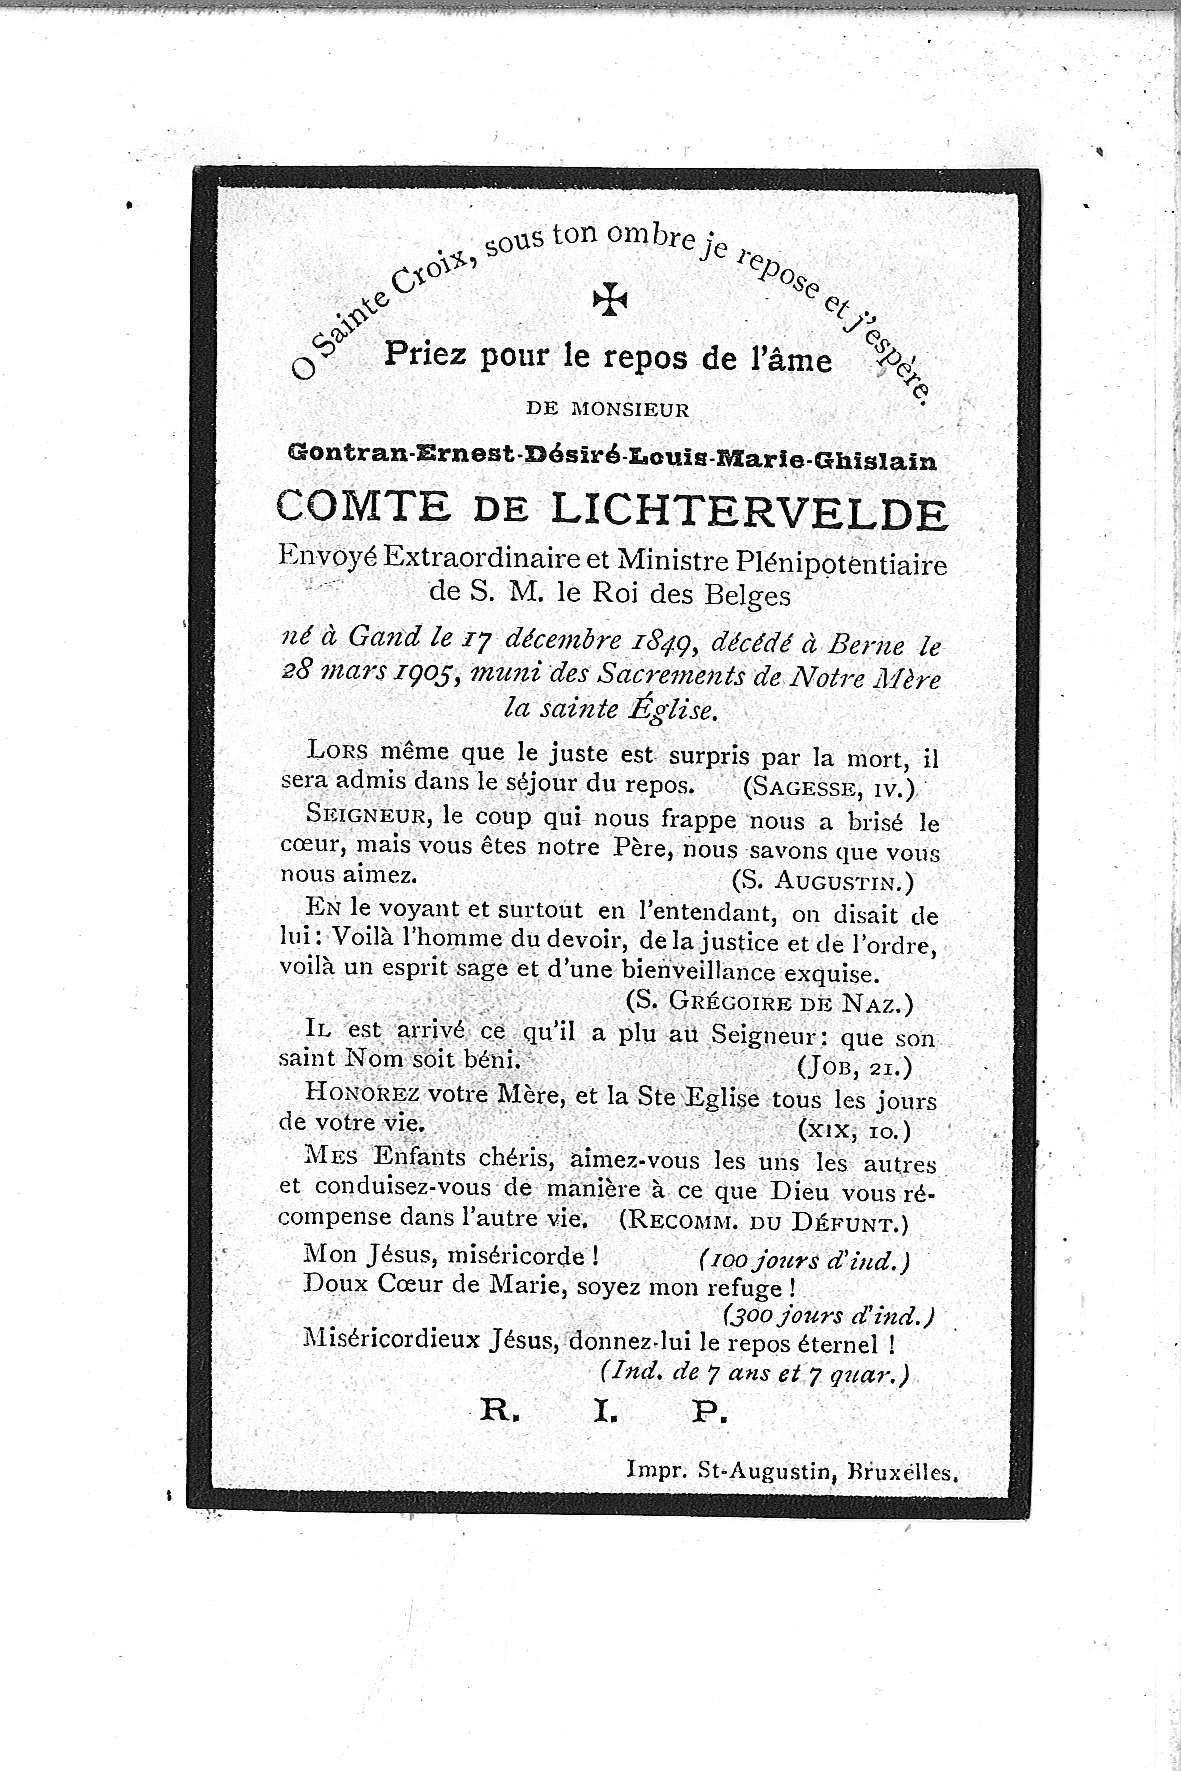 Goutran-Ernest-Désiré-Louis-Marie-Ghislain-(1905)-20121015153820_00093.jpg